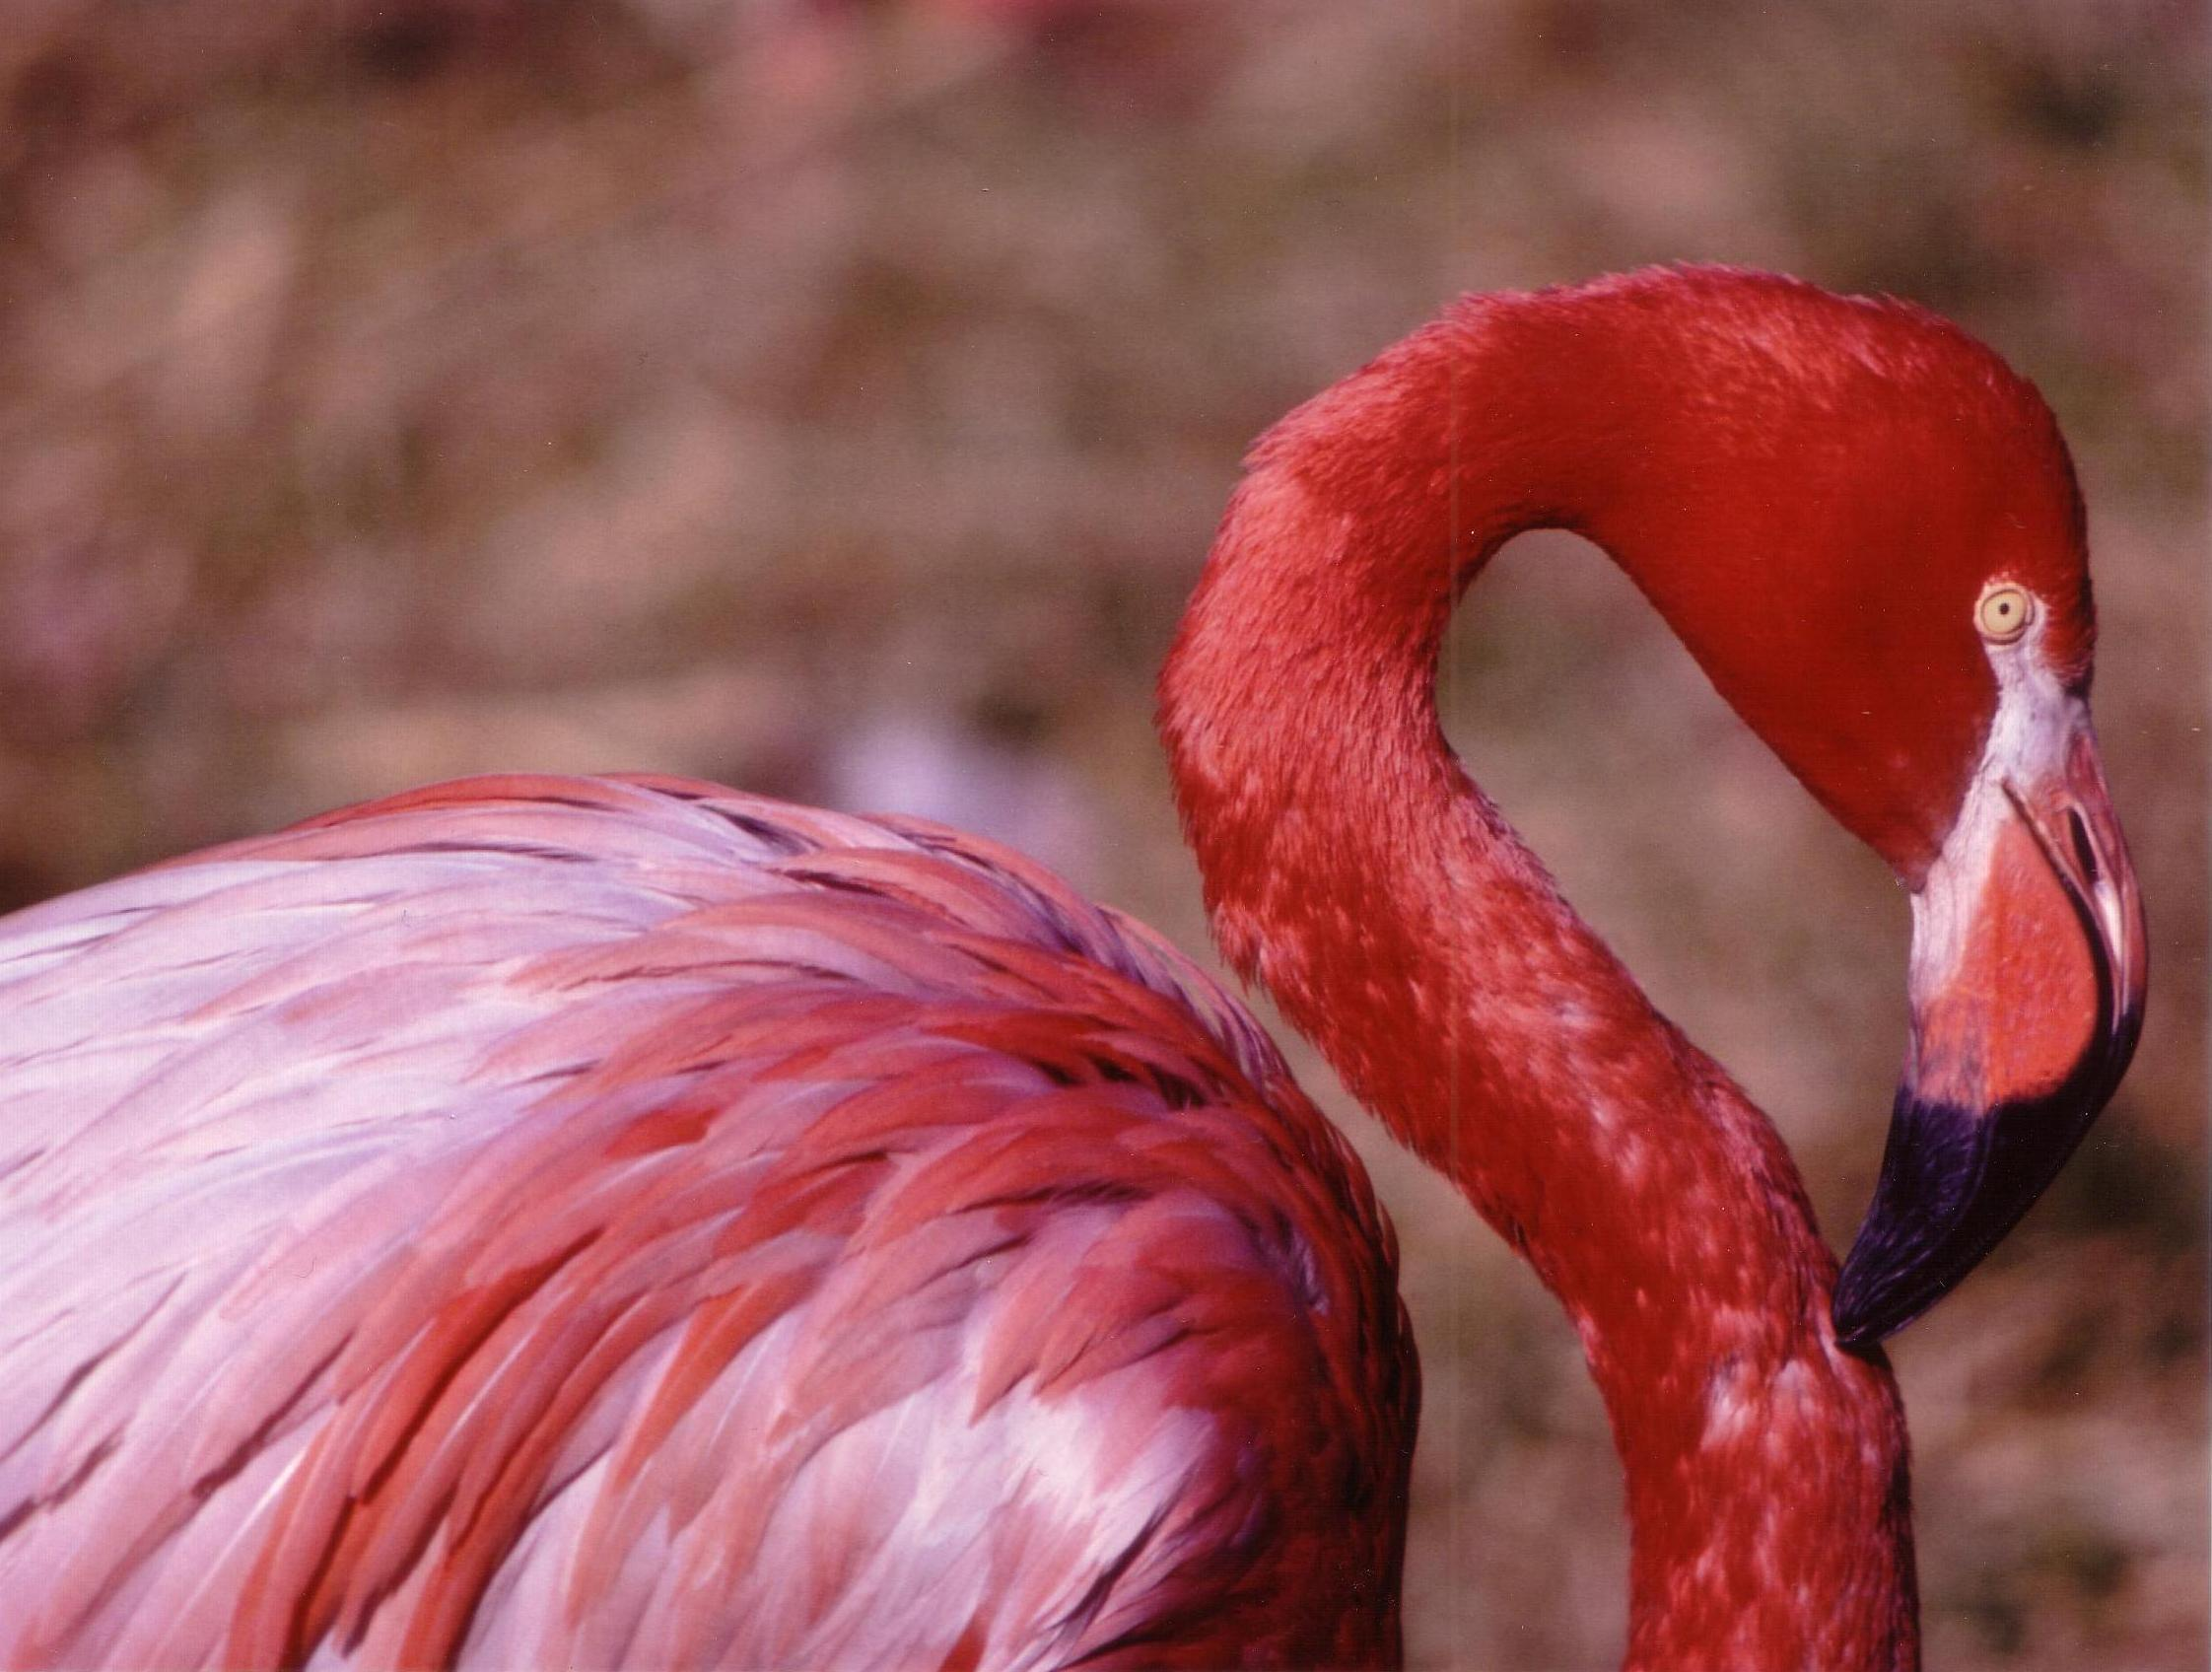 Photo courtesy of Smithsonian's National Zoological Park